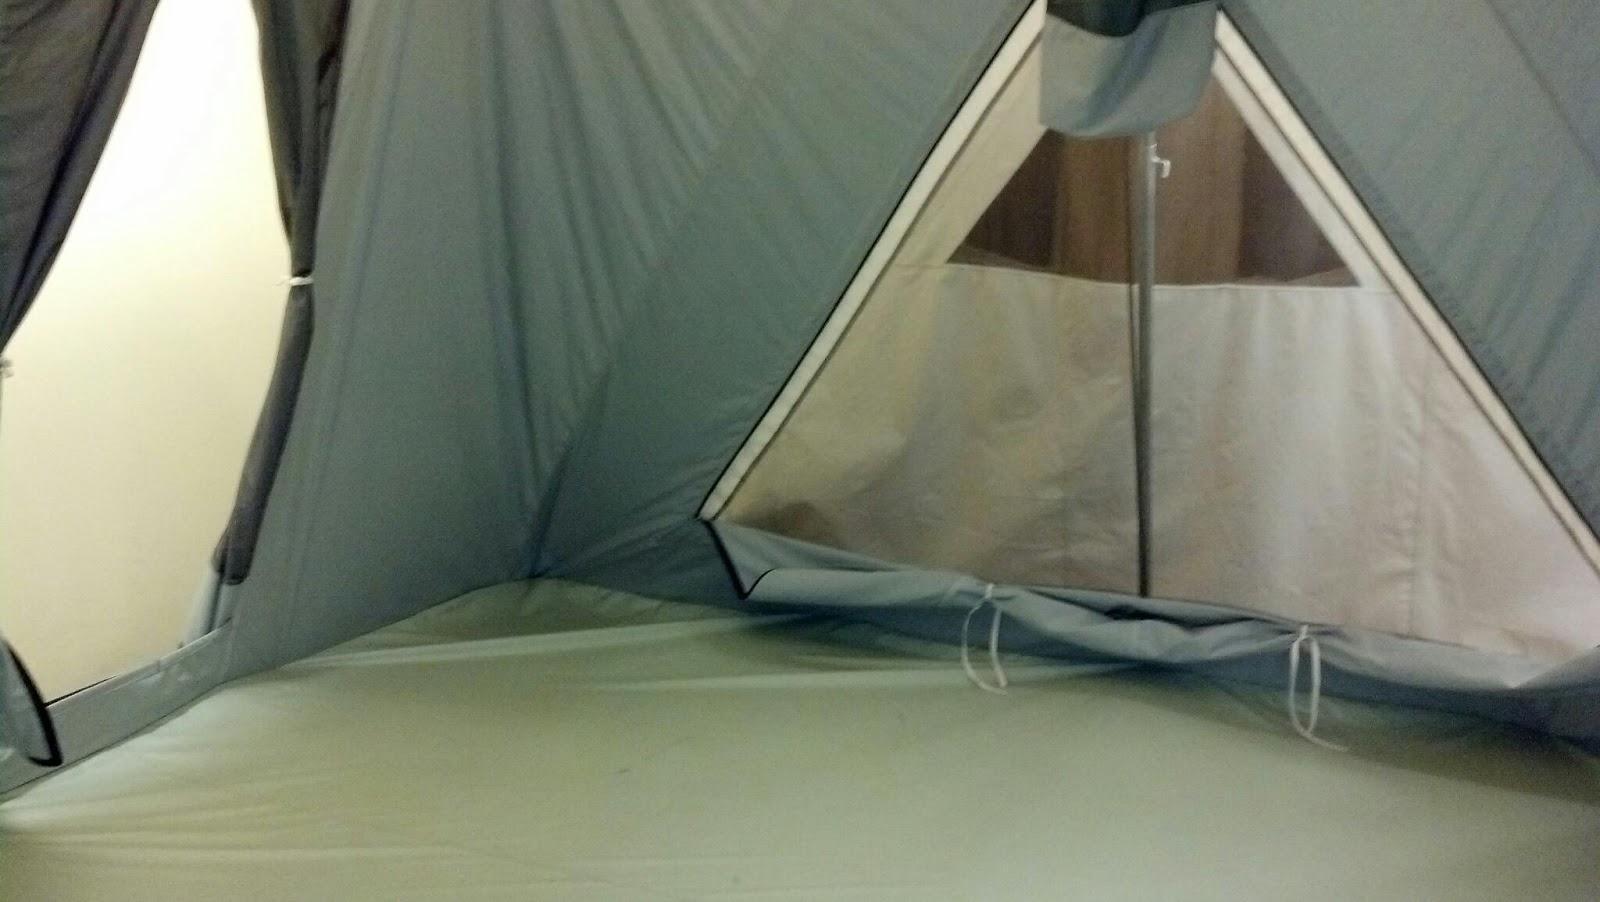 Home of the Springbar Tent & Mountain Kimmieu0027s Big Adventure: Home of the Springbar Tent